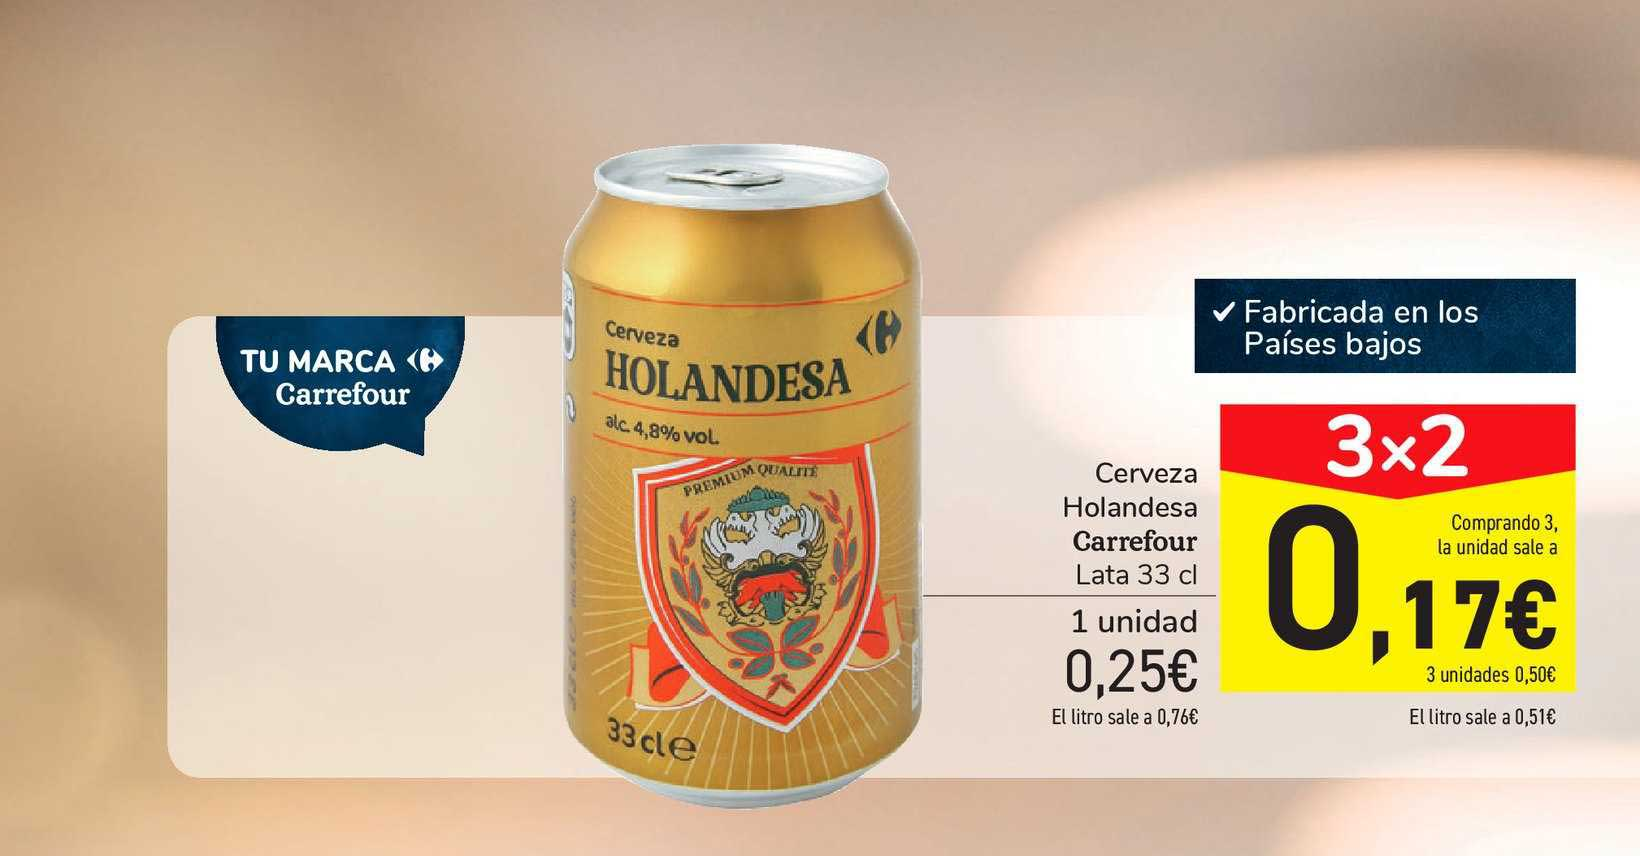 Carrefour 3x2 Cerveza Holandesa Carrefour Lata 33 Cl